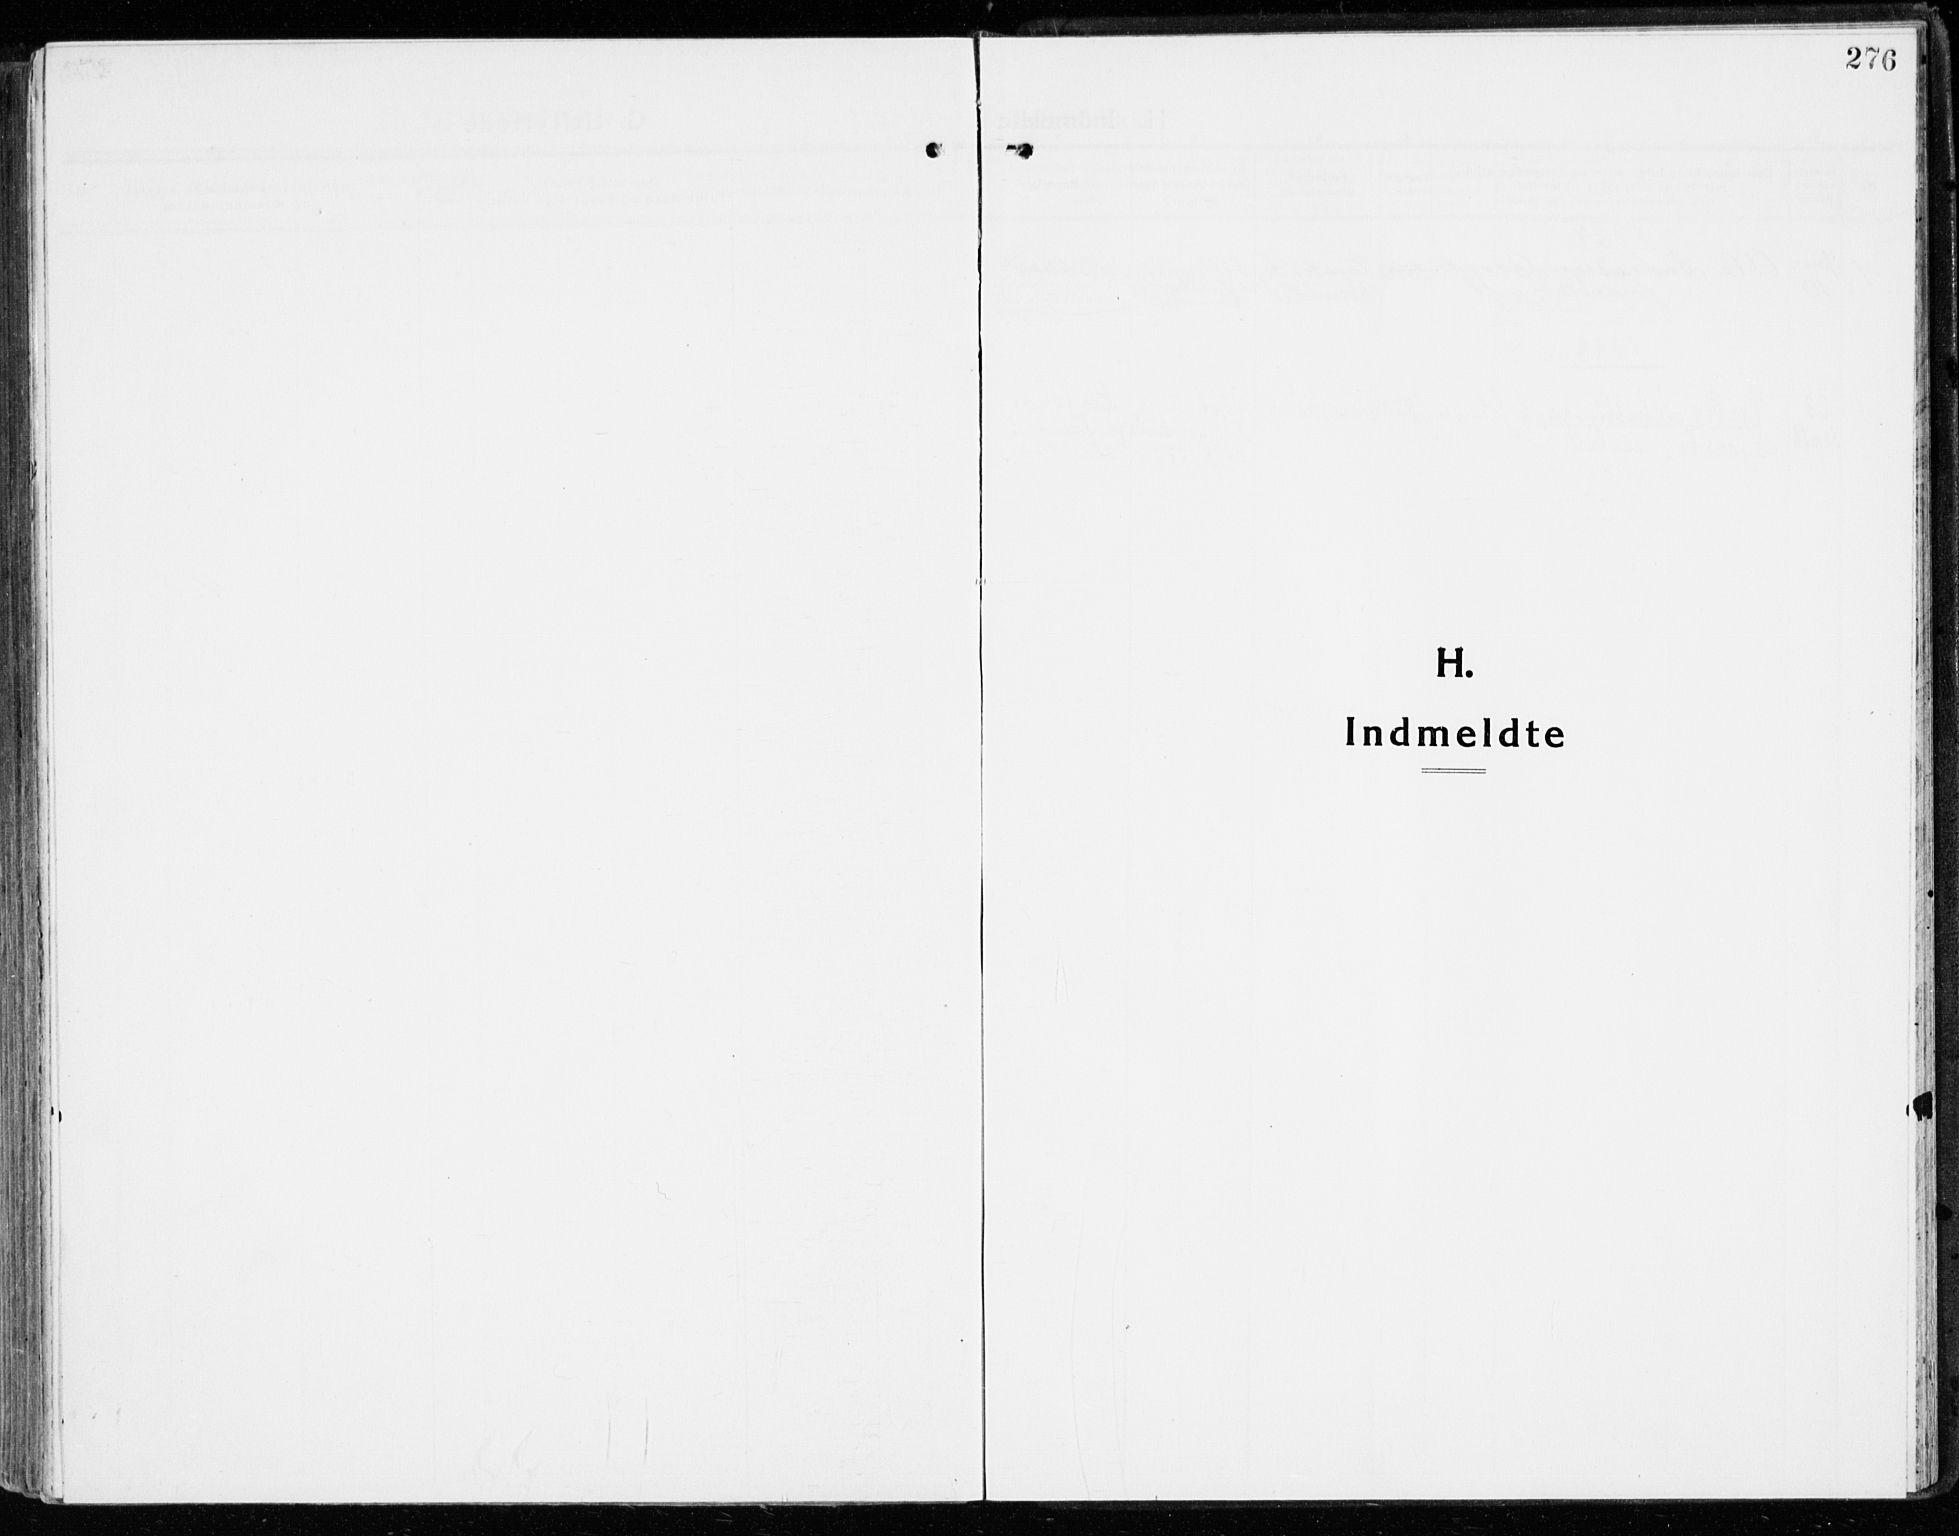 SAH, Stange prestekontor, K/L0025: Ministerialbok nr. 25, 1921-1945, s. 276